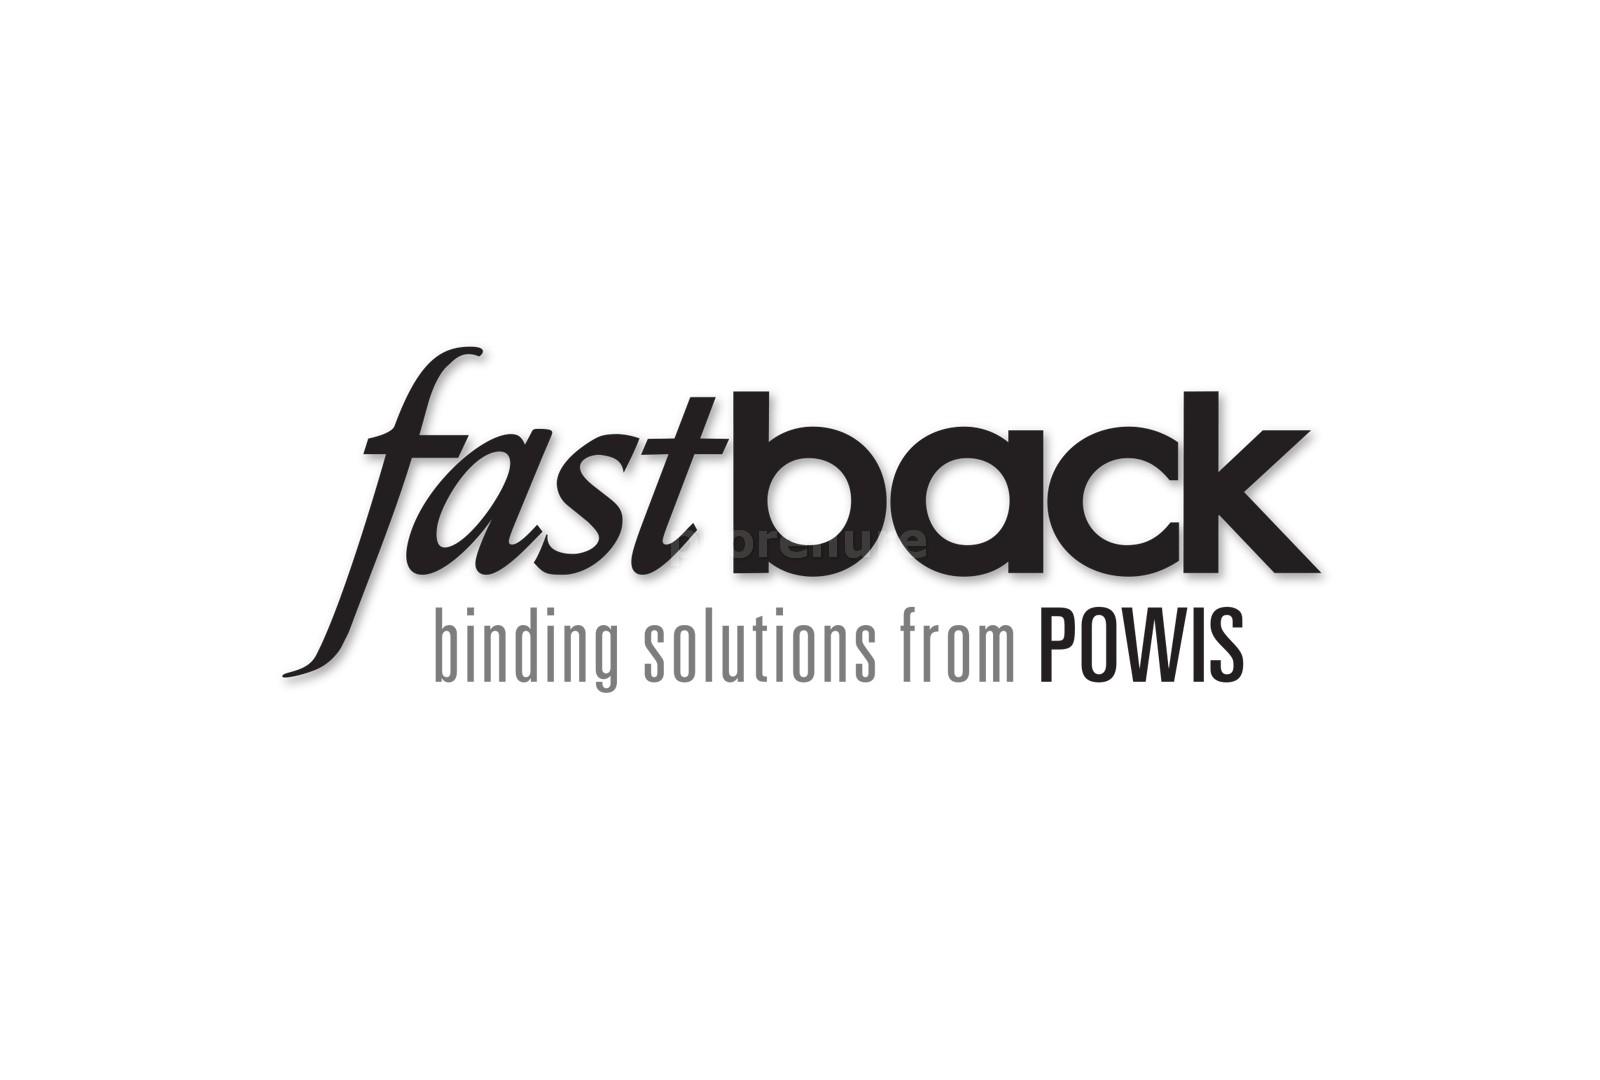 Fastback-Powis-black- logo